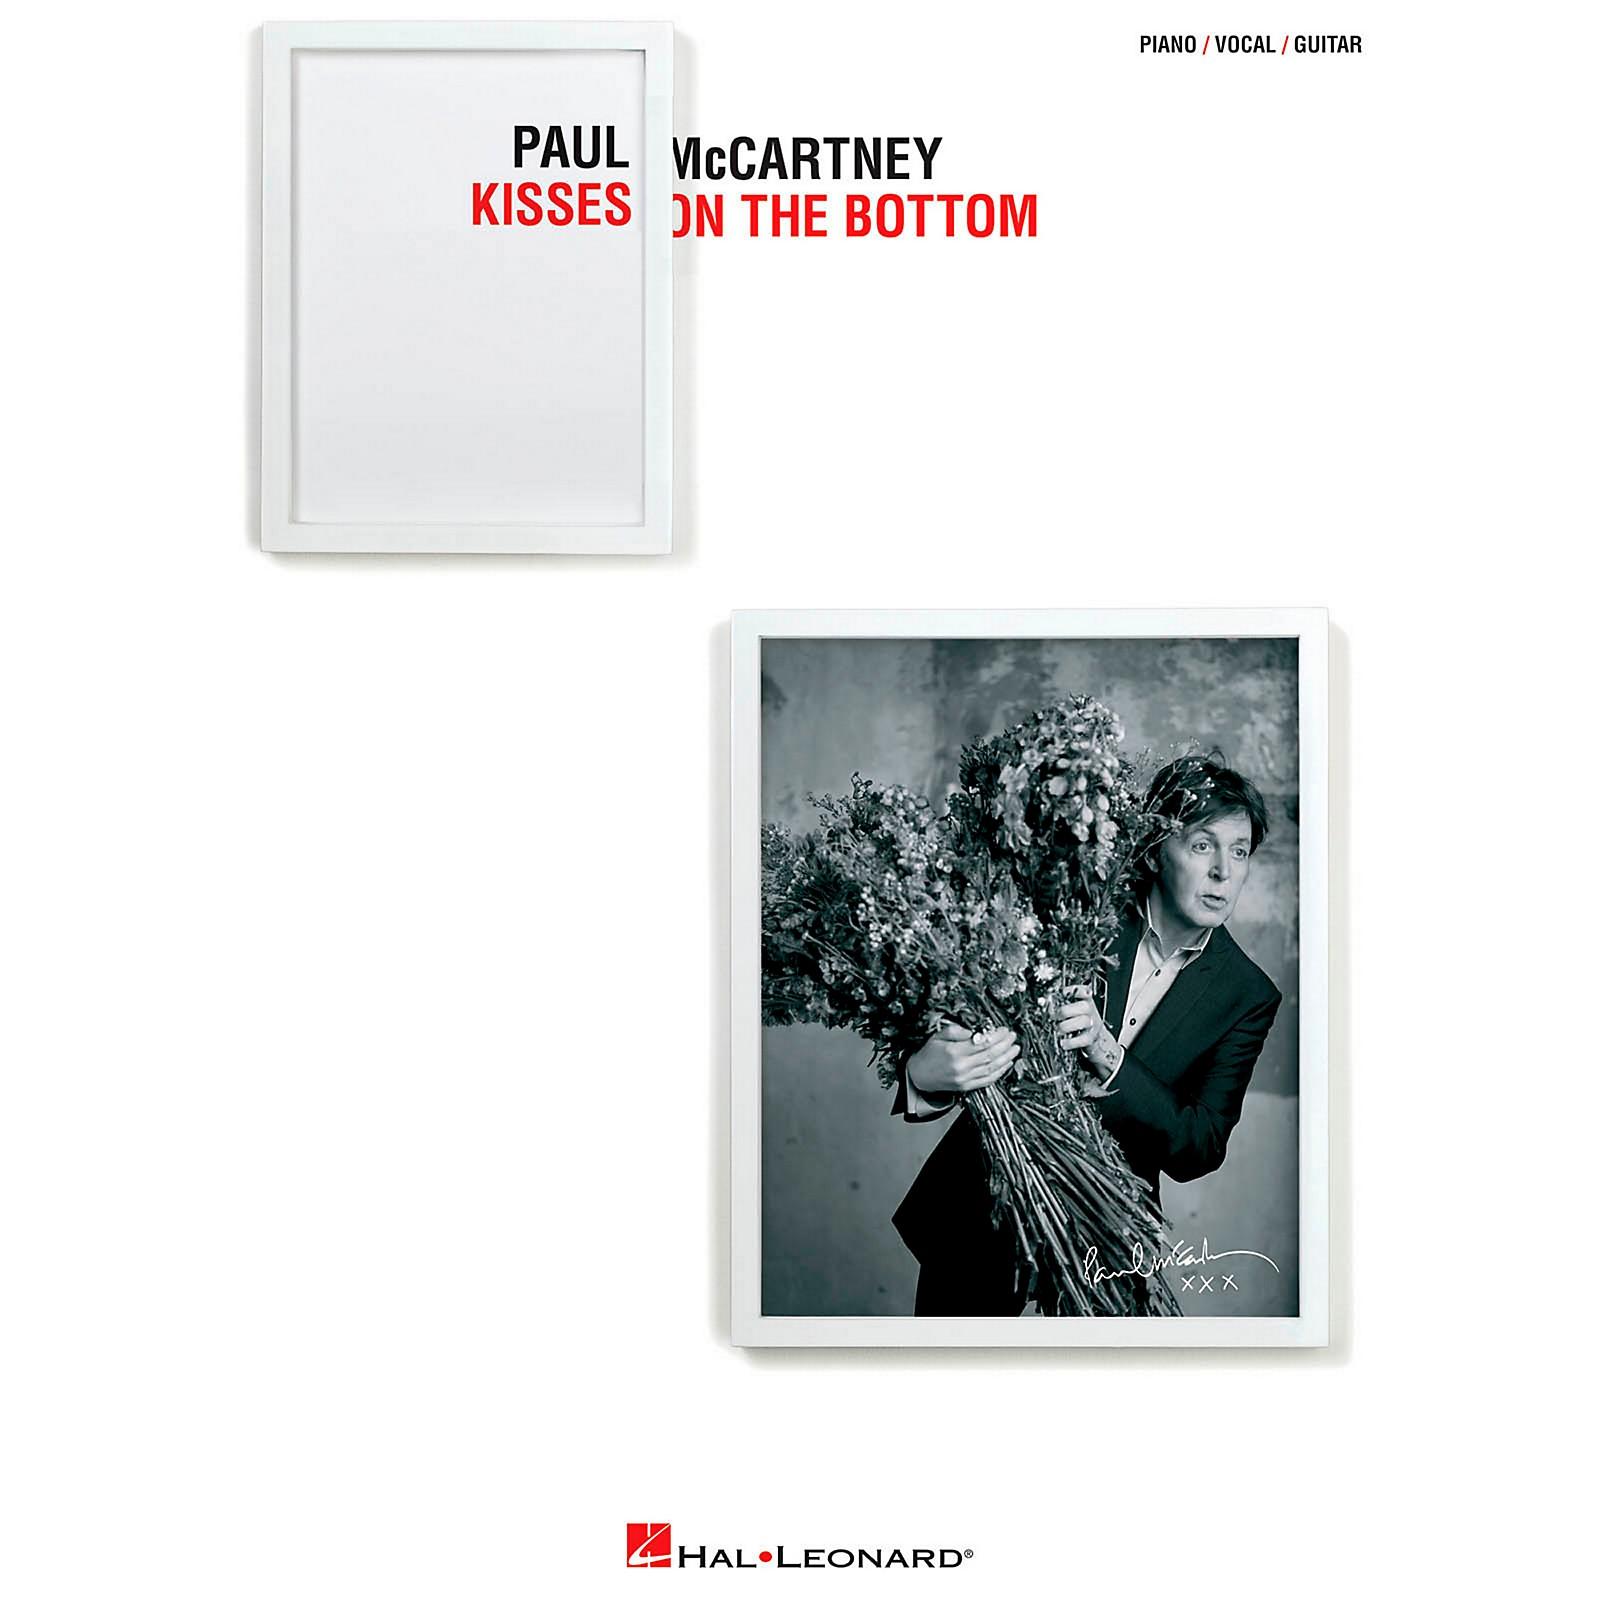 Hal Leonard Paul Mccartney - Kisses On The Bottom for Piano/Vocal/Vocal PVG